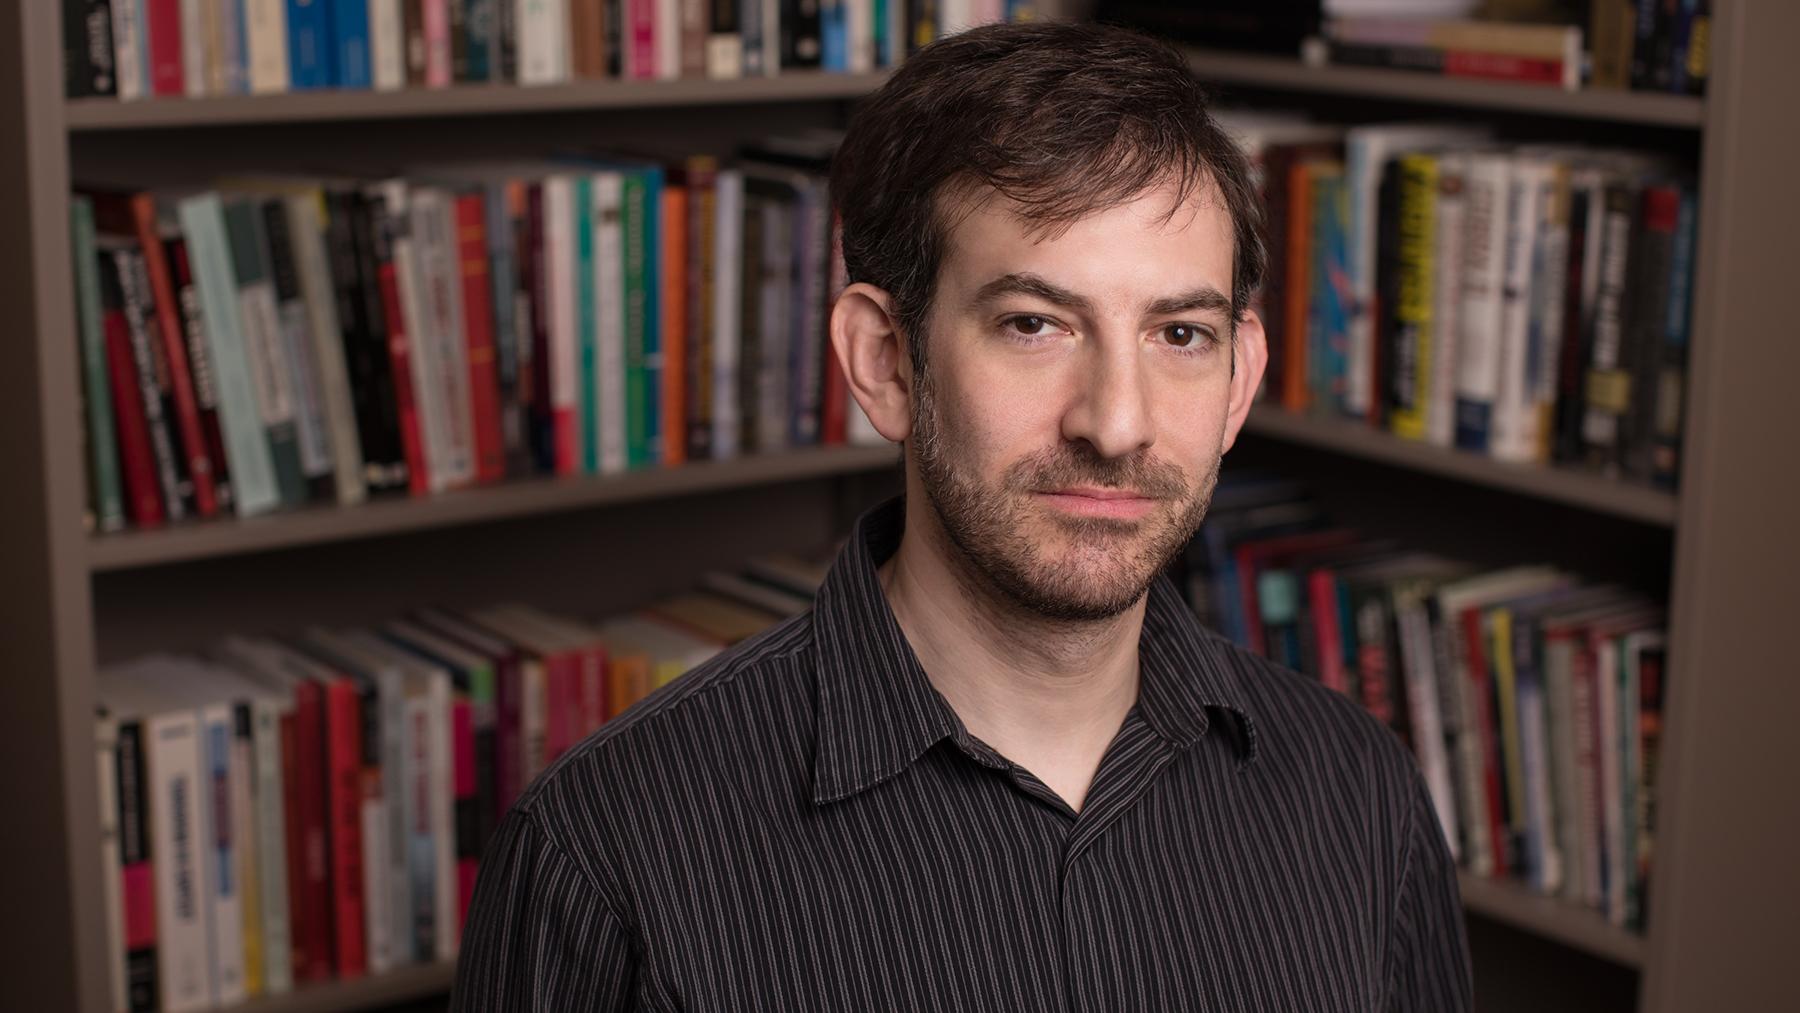 political science professor Nick Grossman. Photo by L. B. Stauffer